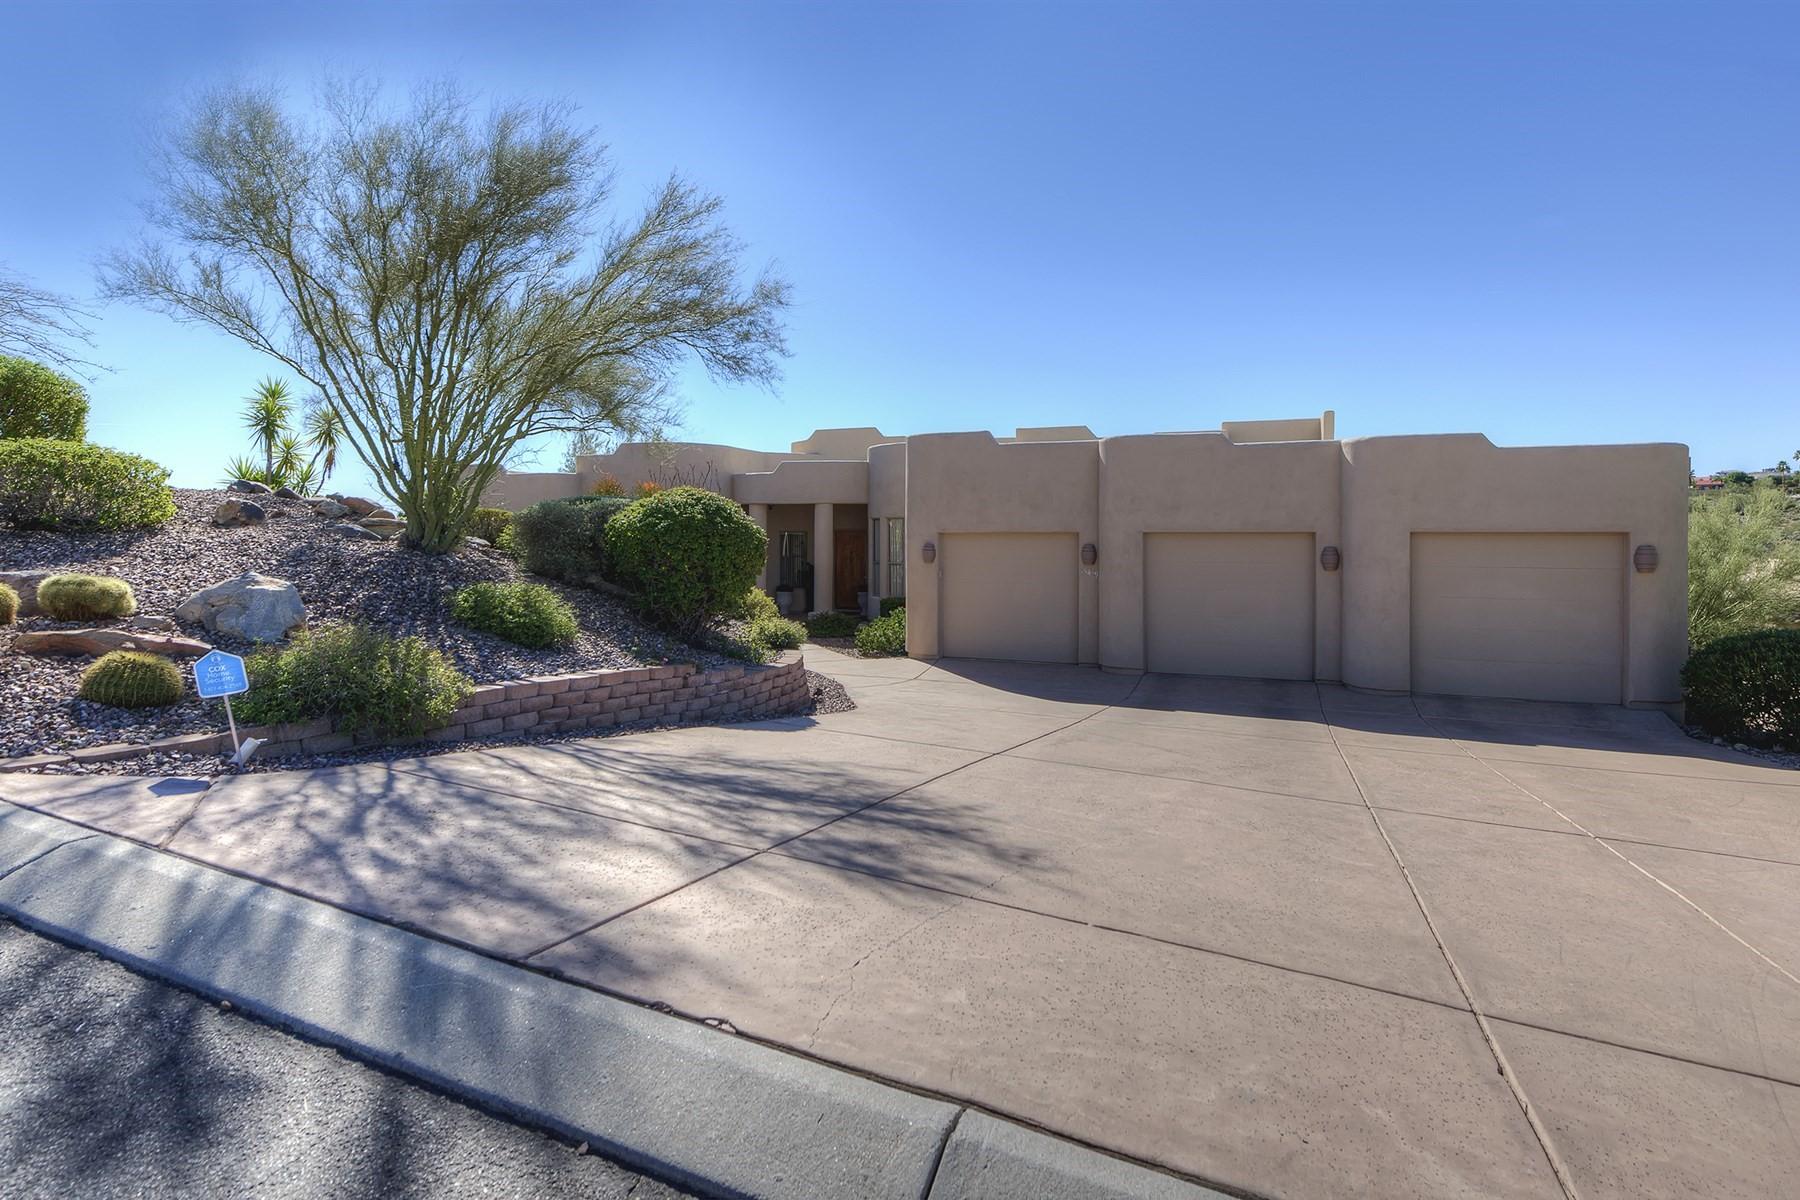 Single Family Home for Sale at Beautiful hillside home in Fountain Hills 15439 E SUNBURST DR Fountain Hills, Arizona, 85268 United States